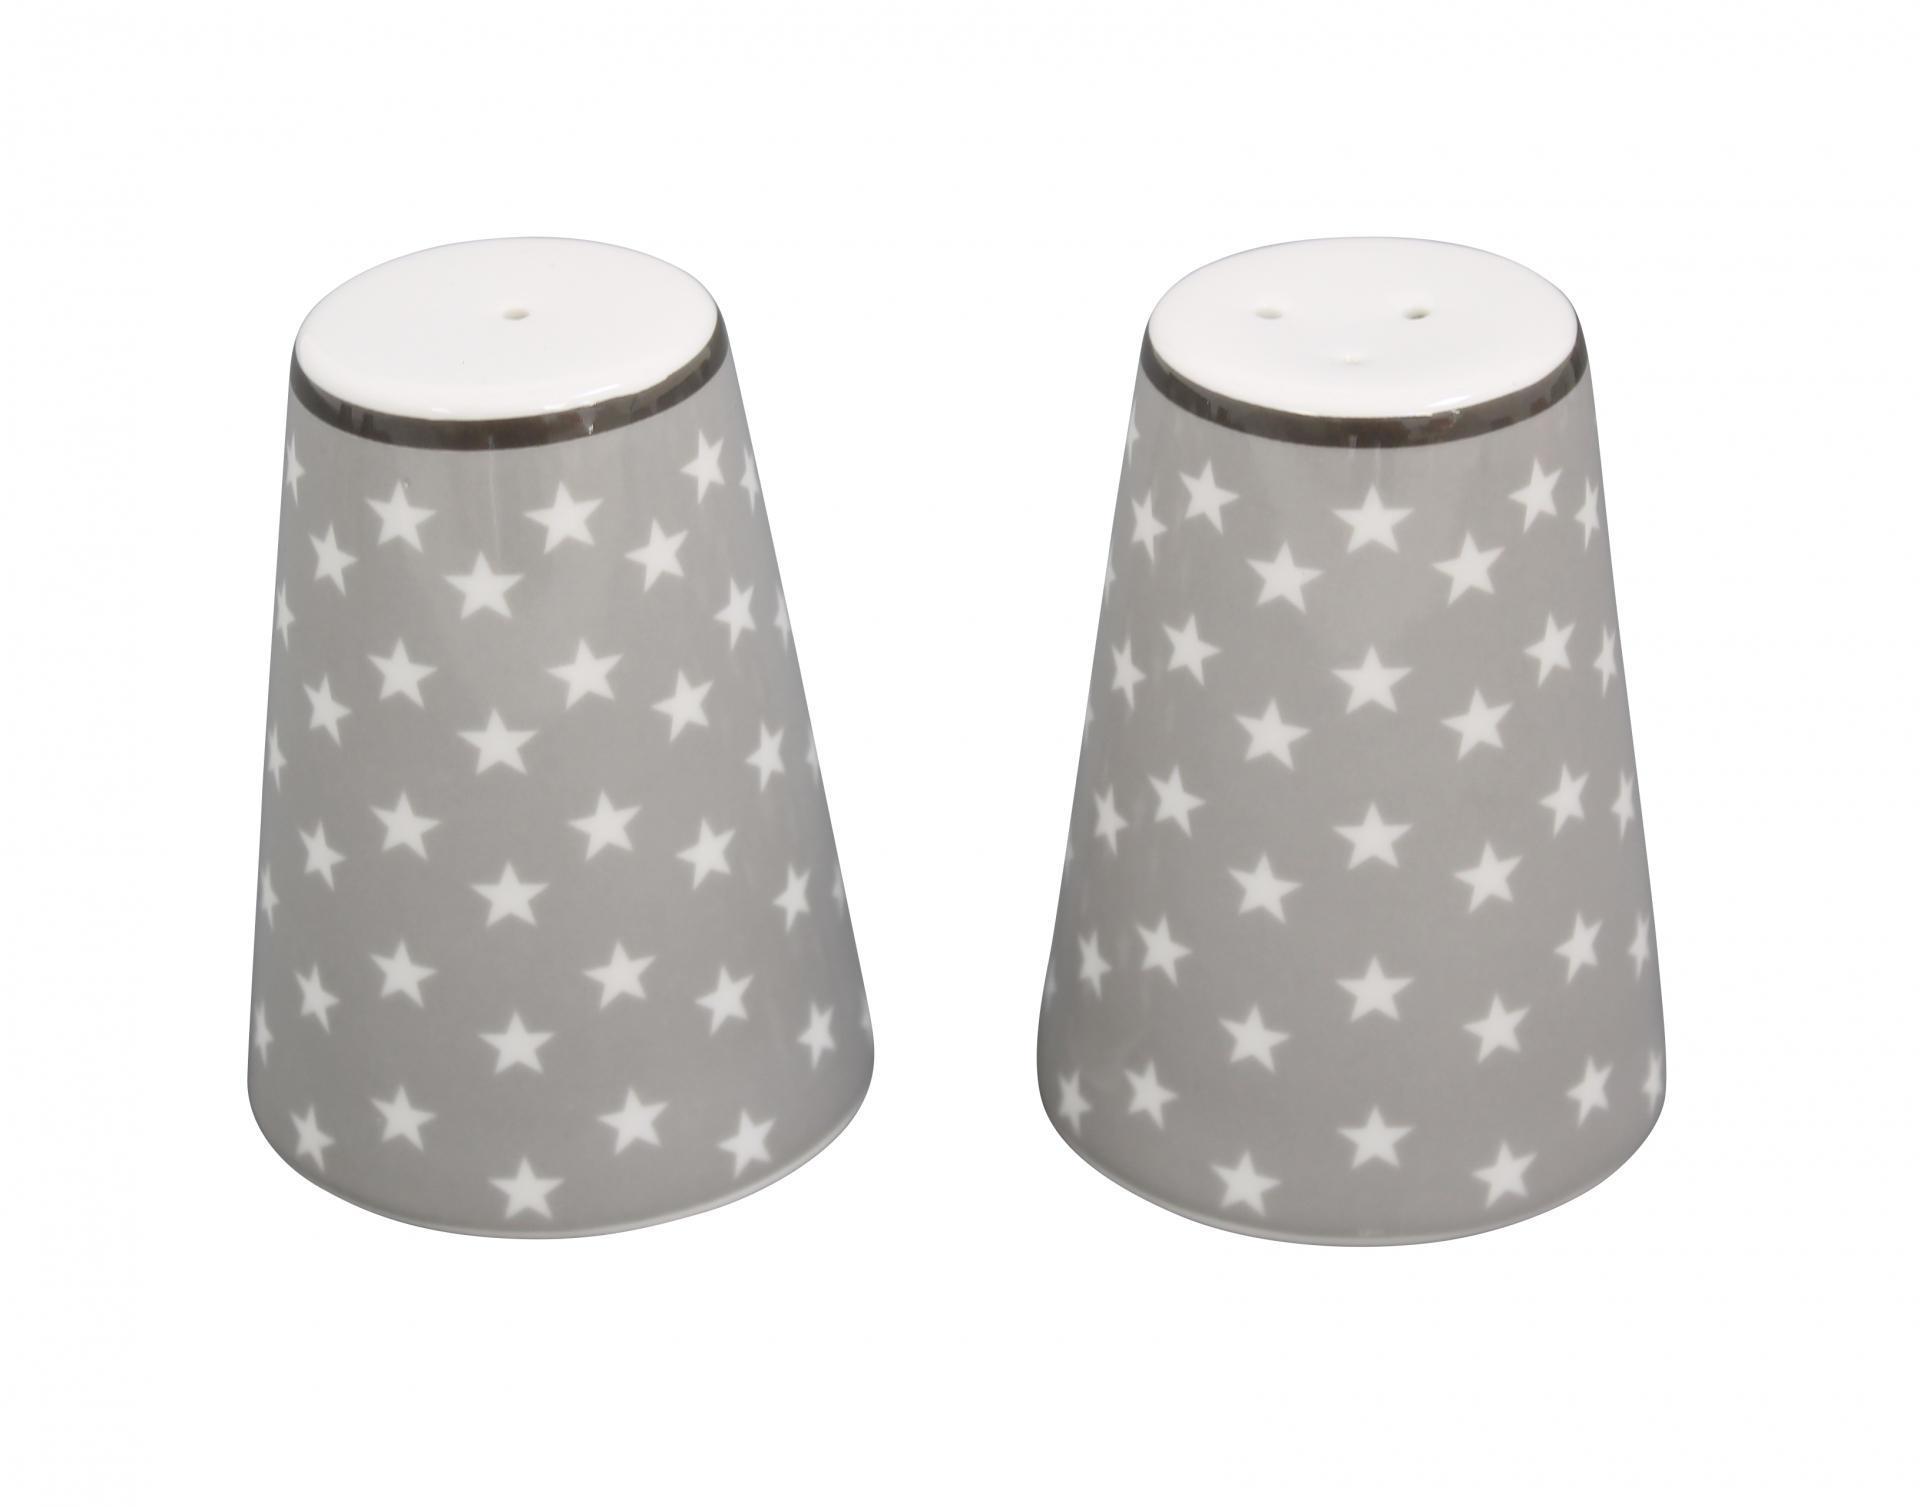 Krasilnikoff Solnička a pepřenka Light grey star, šedá barva, porcelán